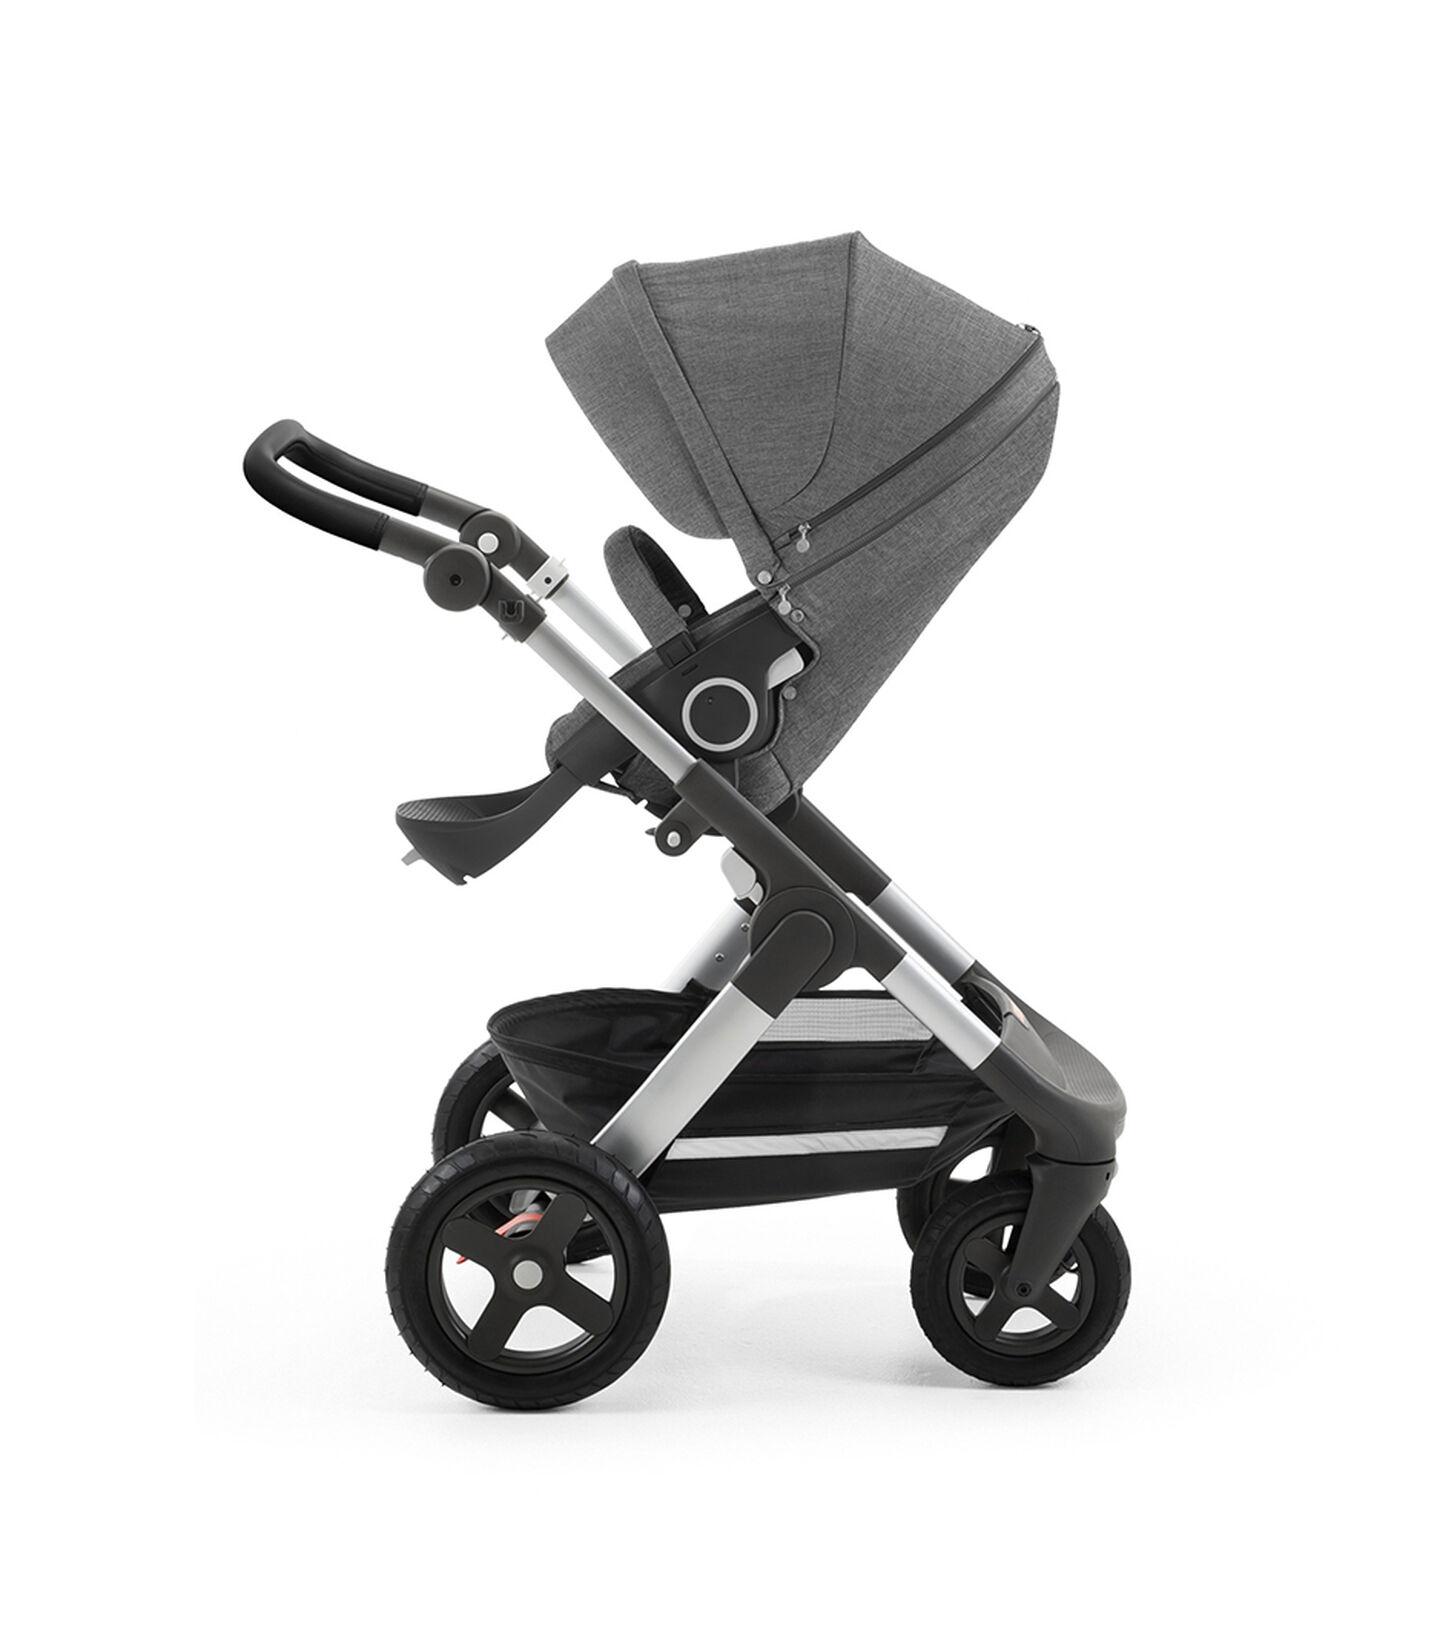 Stokke® Trailz™ with silver chassis and Stokke® Stroller Seat, Black Melange. Leatherette Handle. Terrain Wheels.